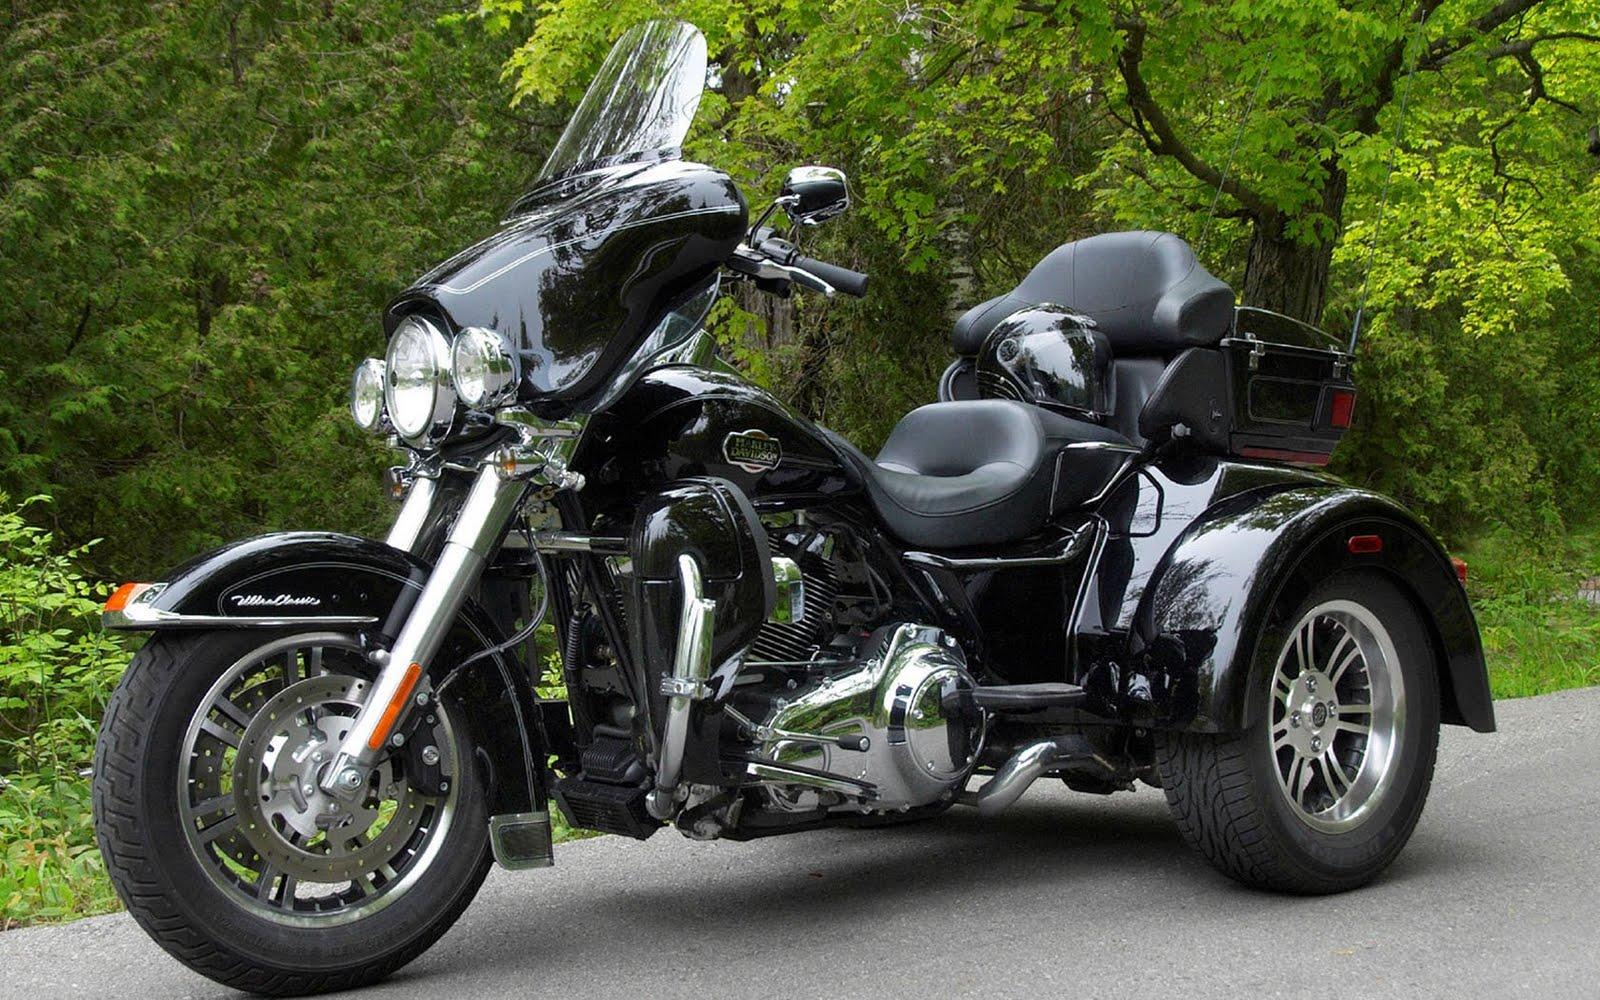 Davidson Bikes Desktop Wallpapers Harley Davidson Desktop Backgrounds 1600x1000